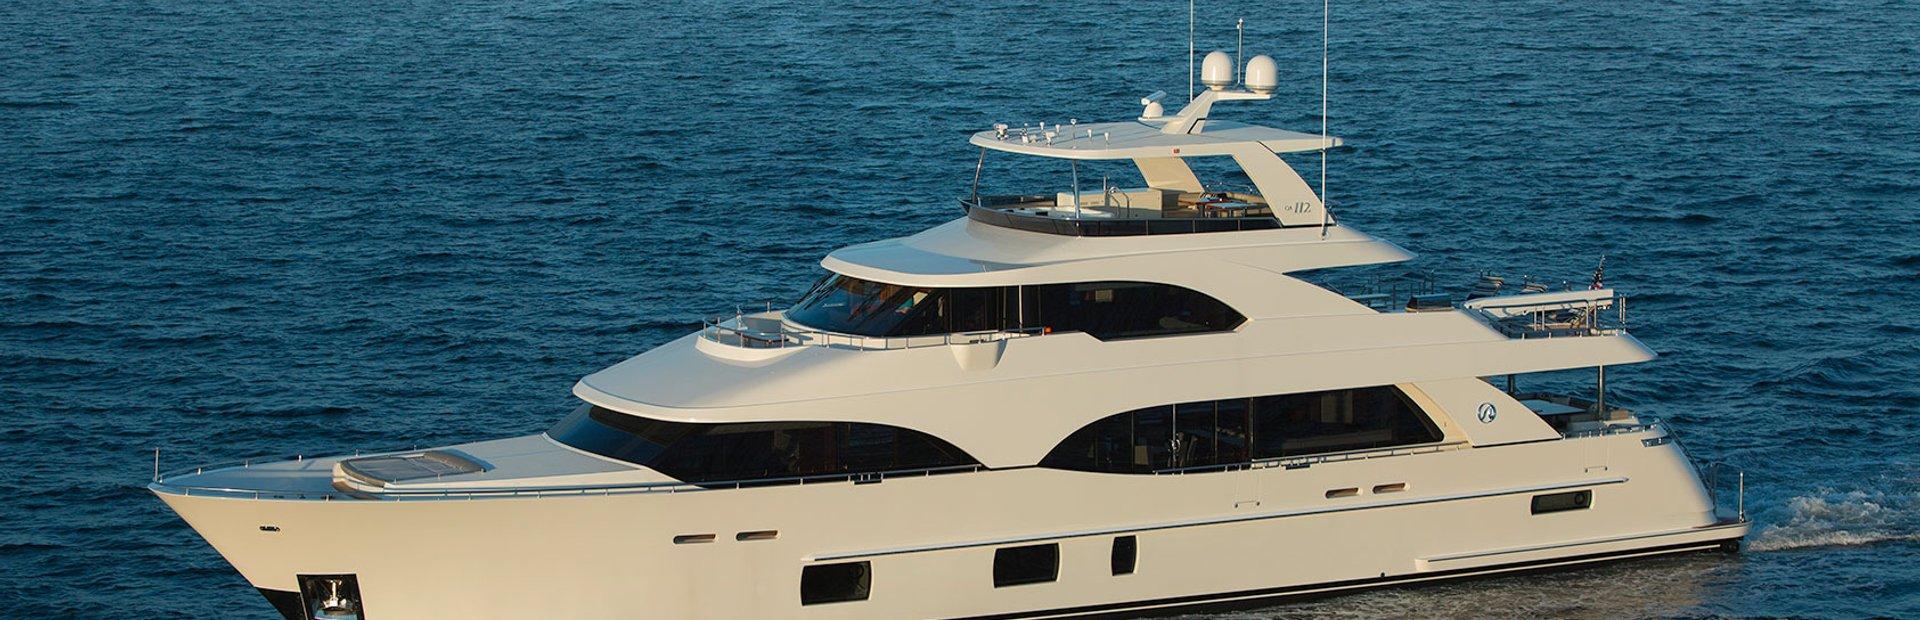 112 Megayacht Yacht Charter